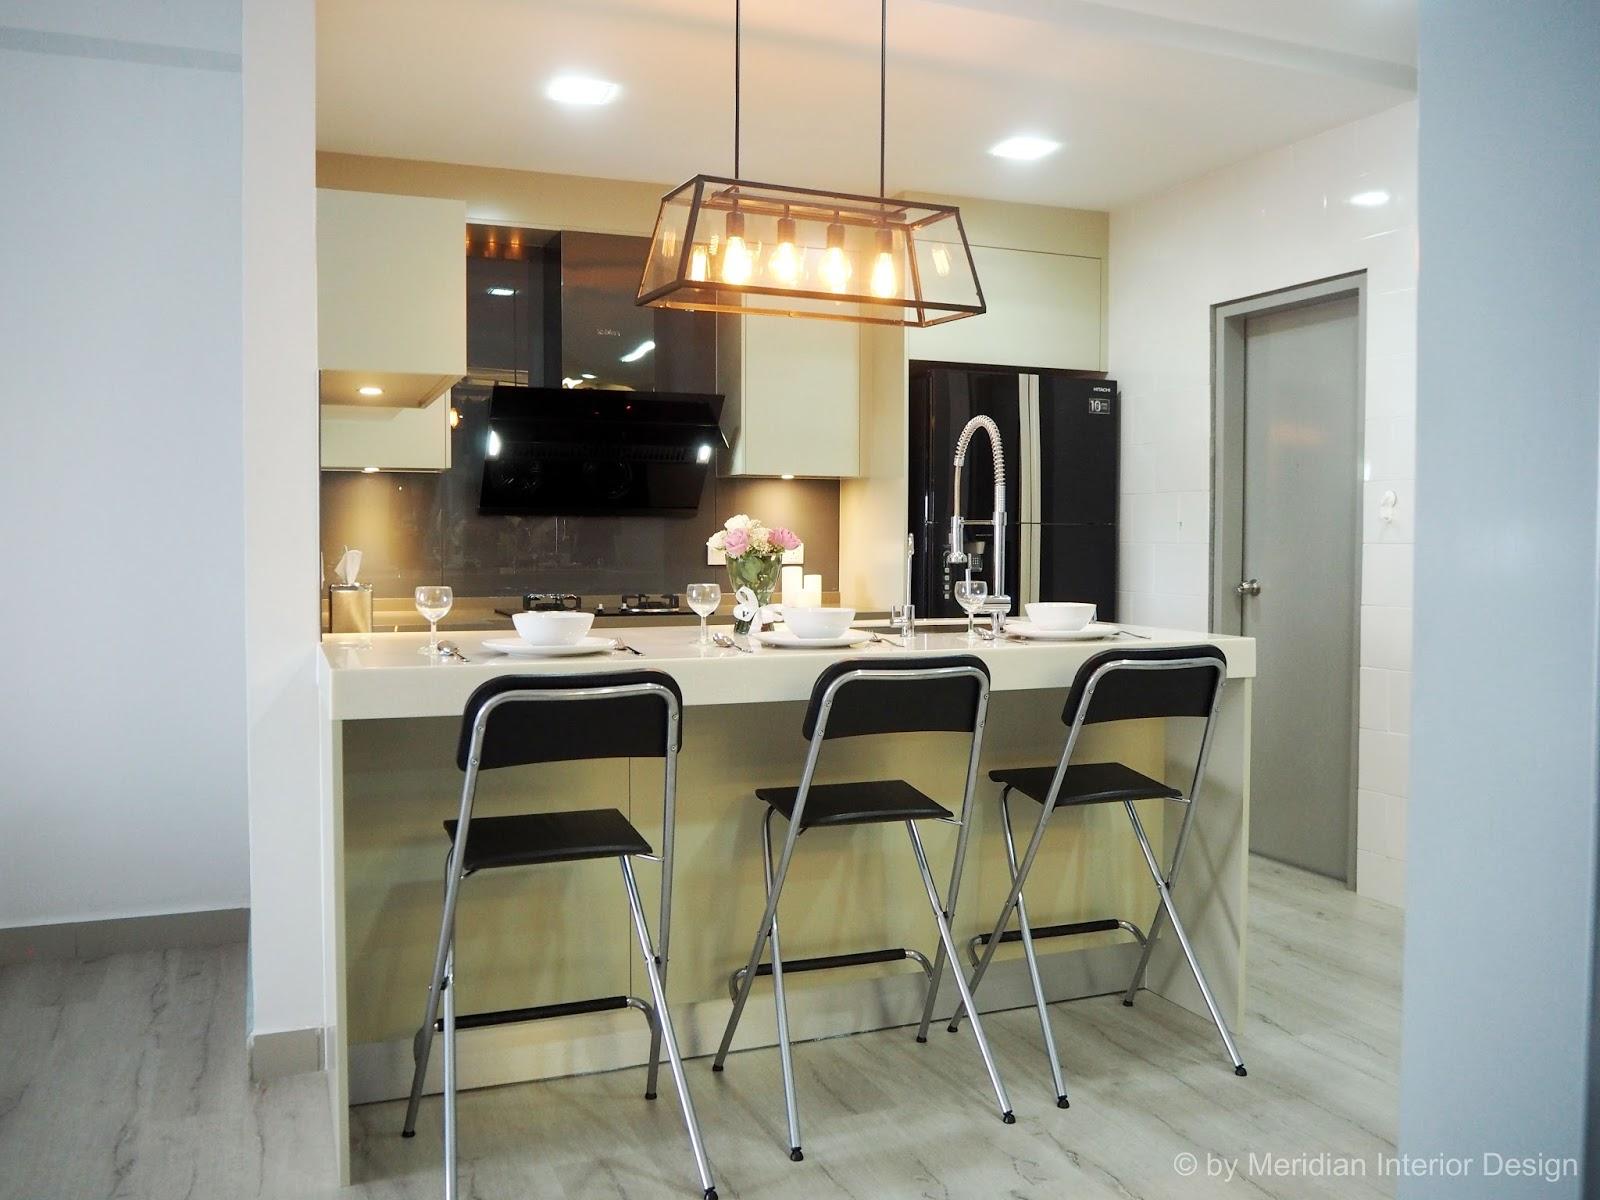 Meridian interior design and kitchen design in kuala for Kitchen design for condo